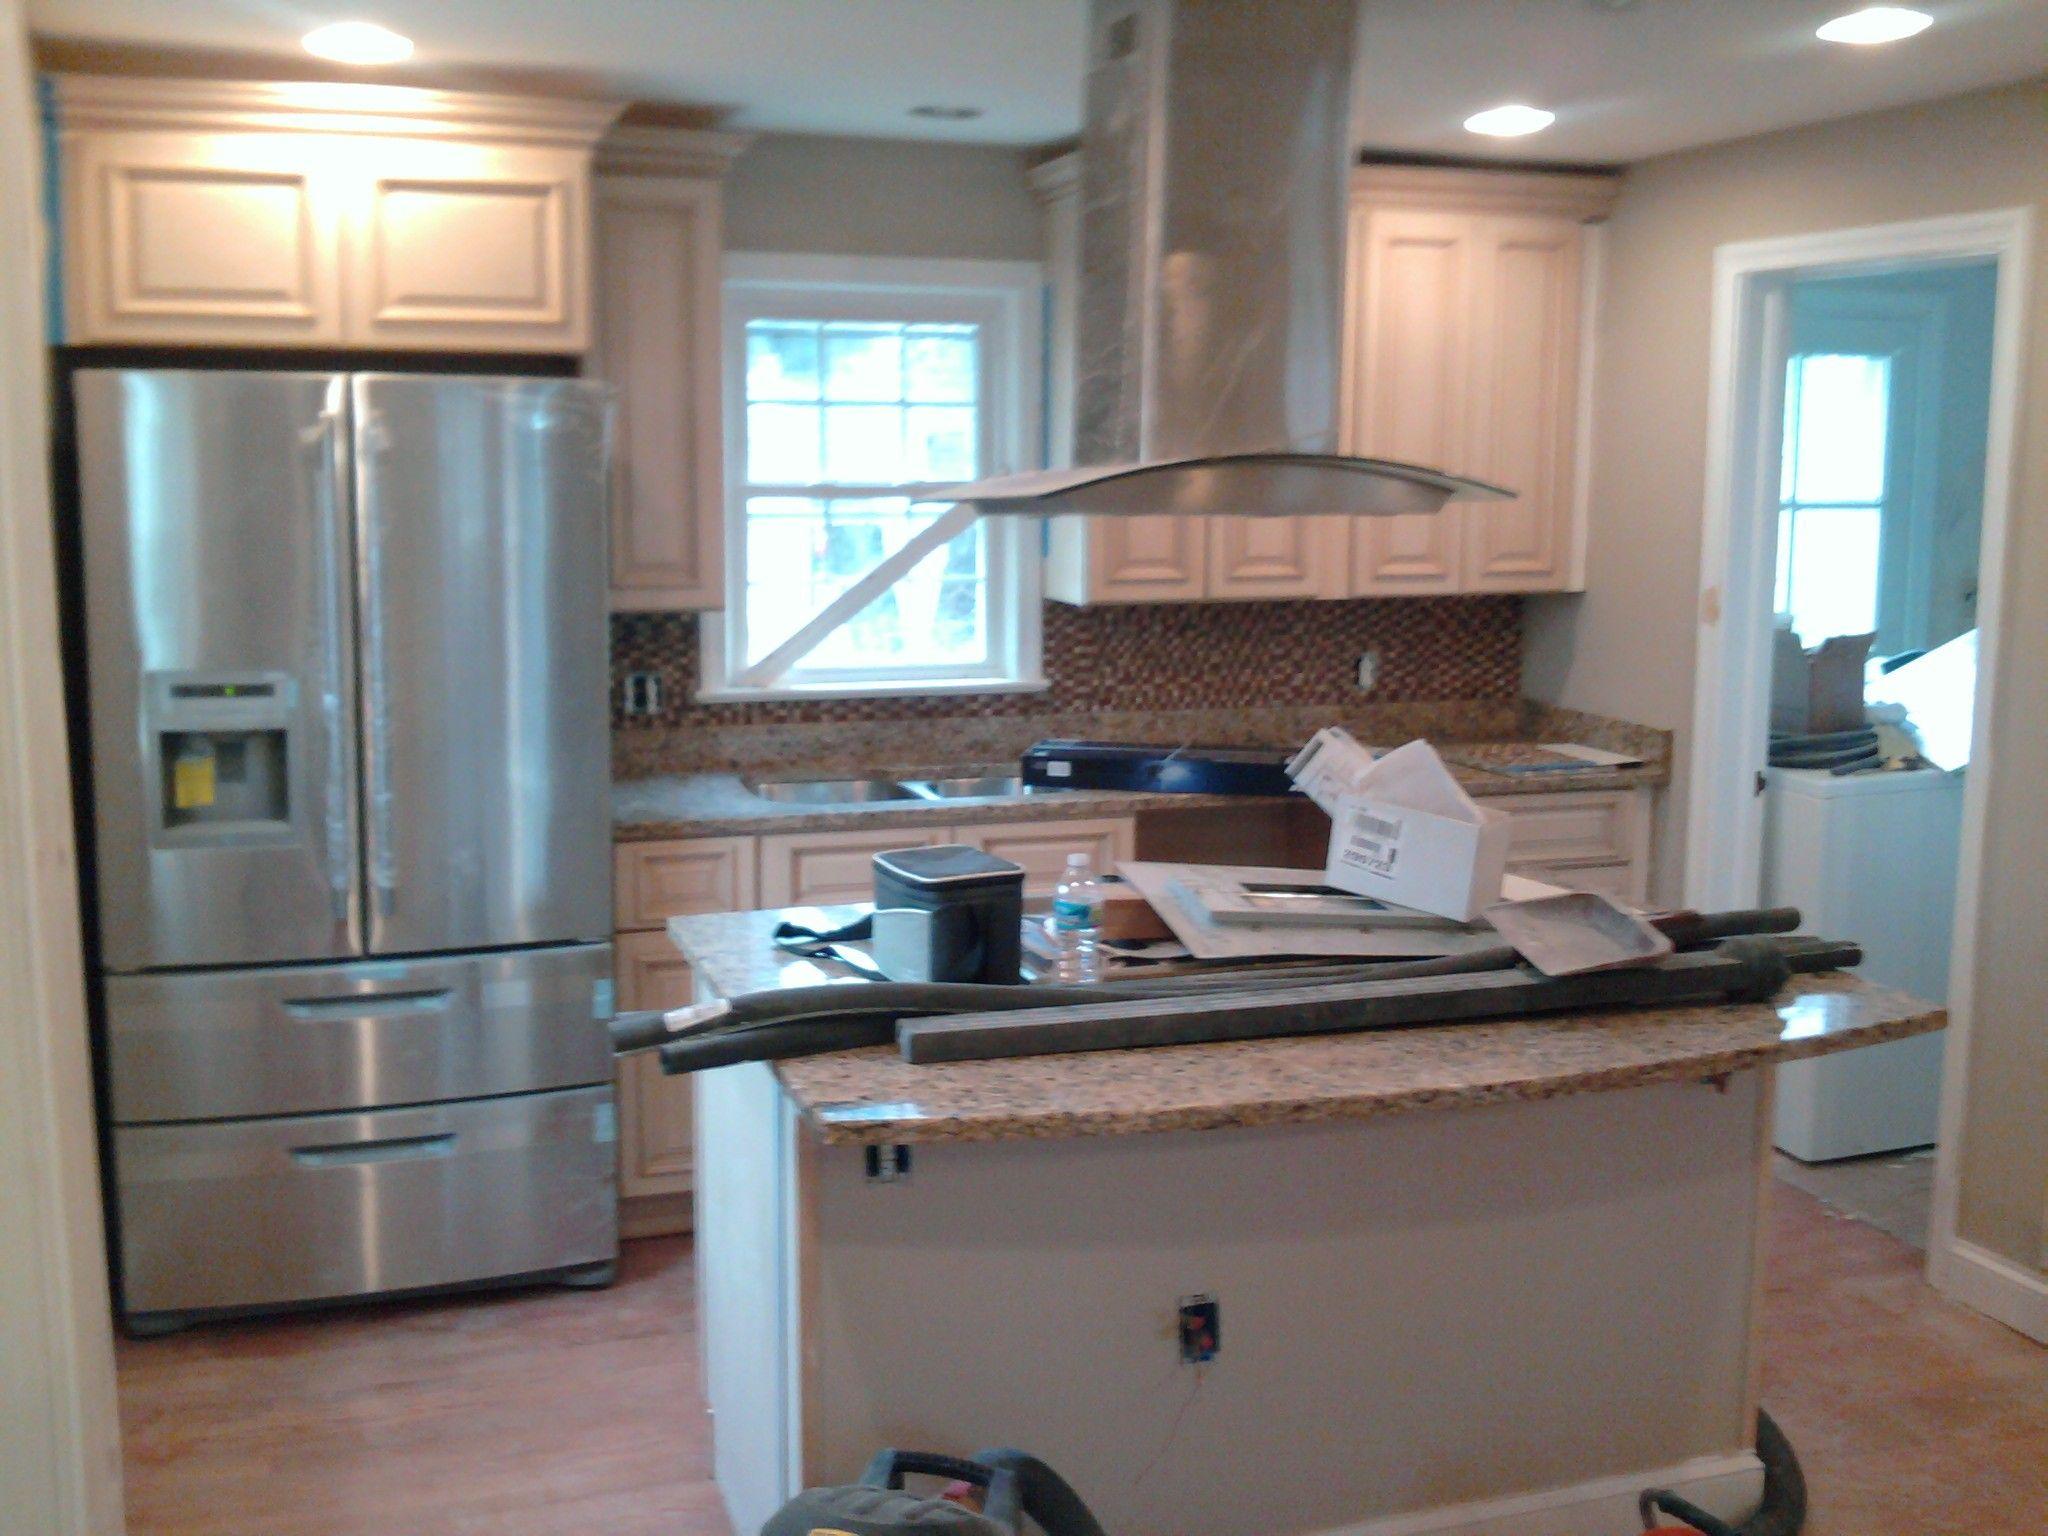 kraftmaid cabinets outlet warren ohio  Home Decor